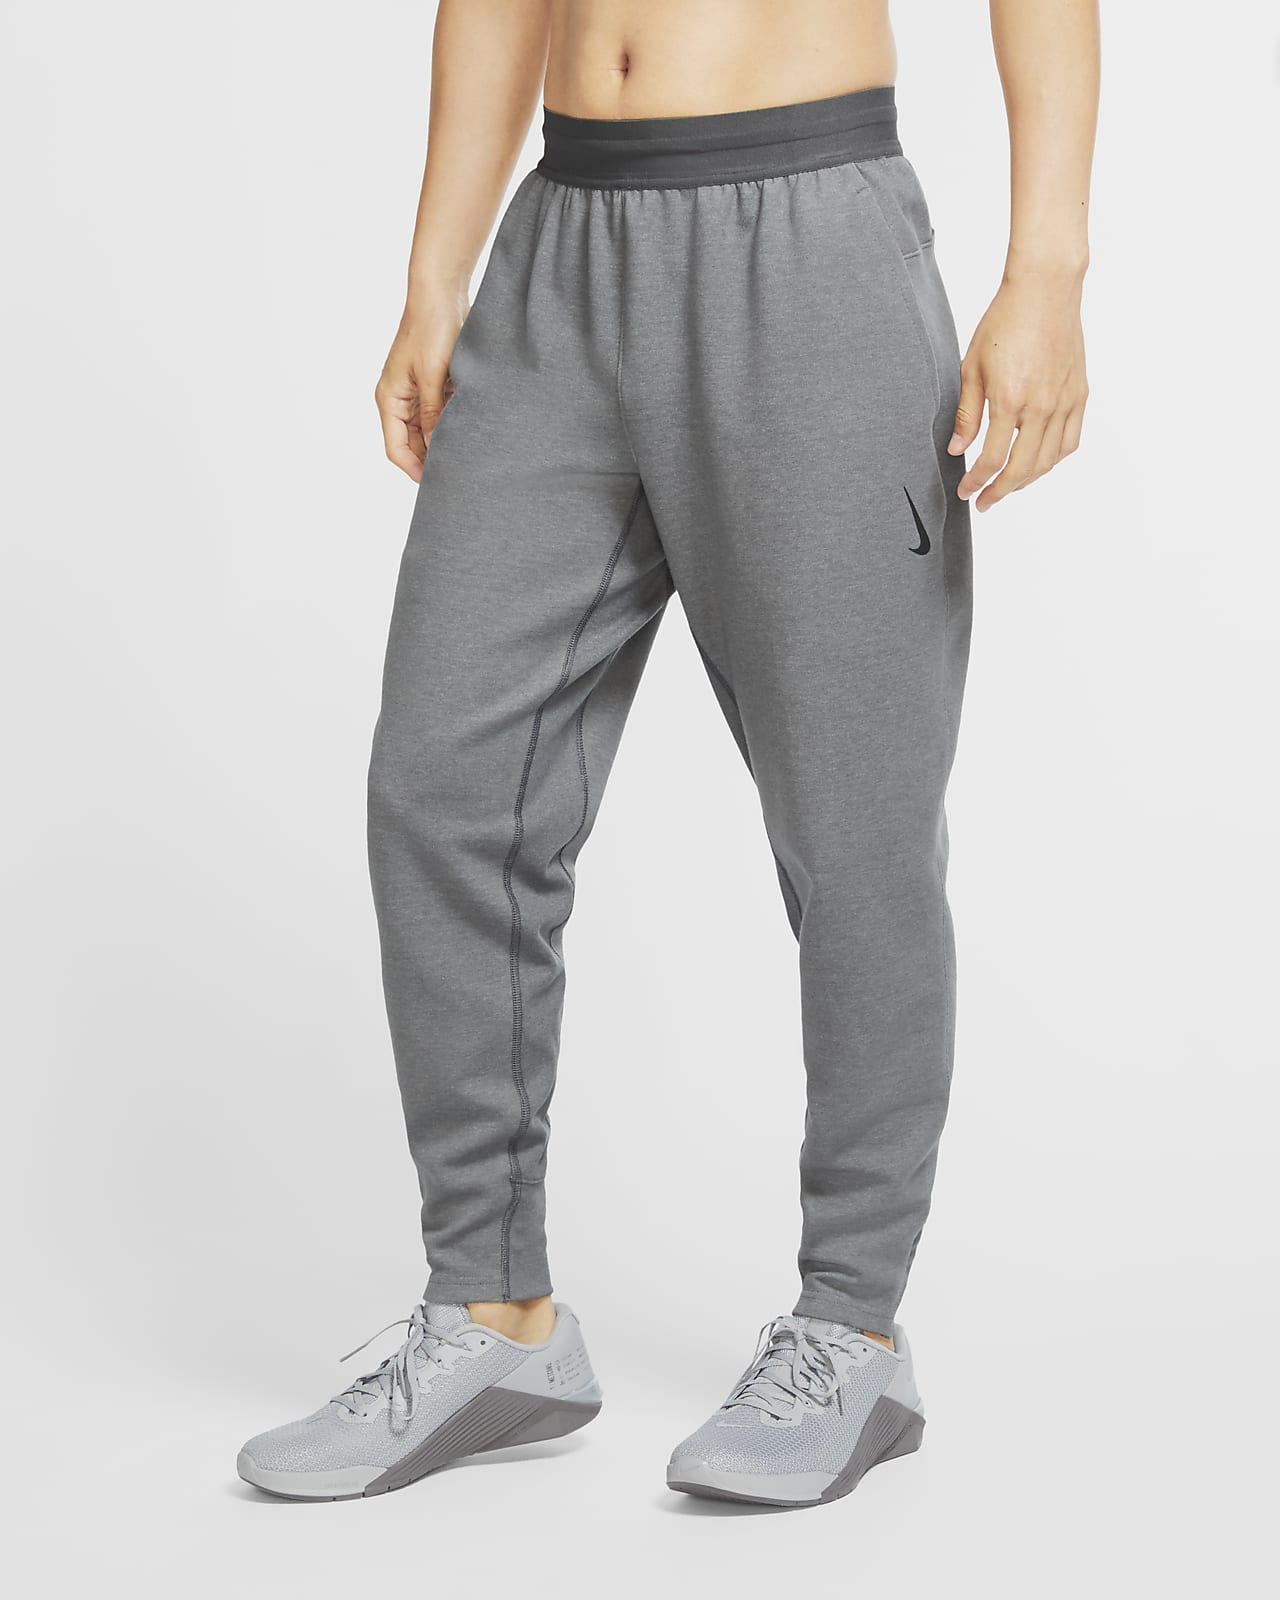 Nike Yoga Men's Trousers. Nike LU